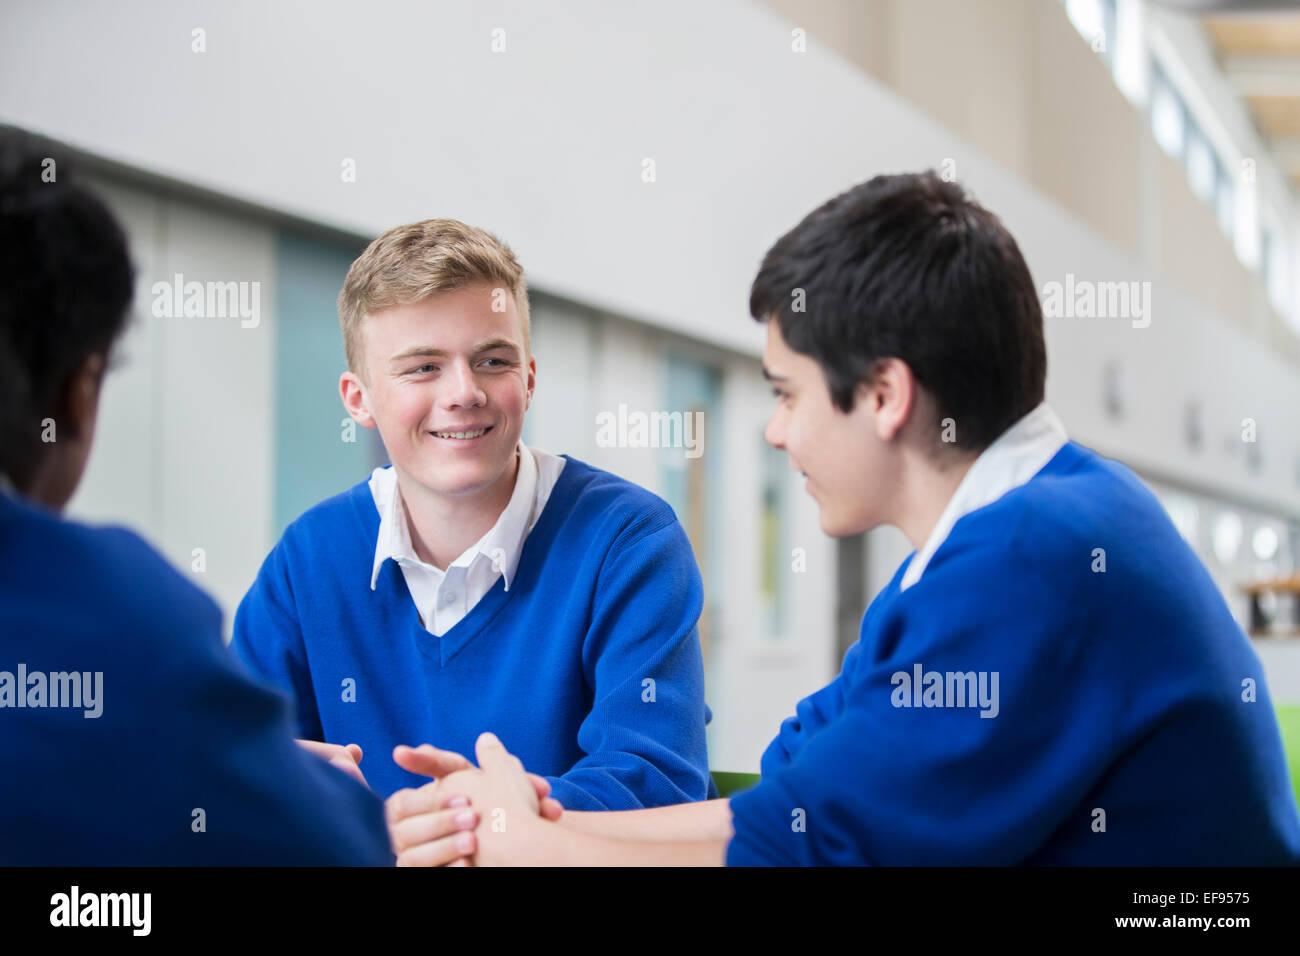 Three male students wearing blue school uniforms talking in corridor - Stock Image